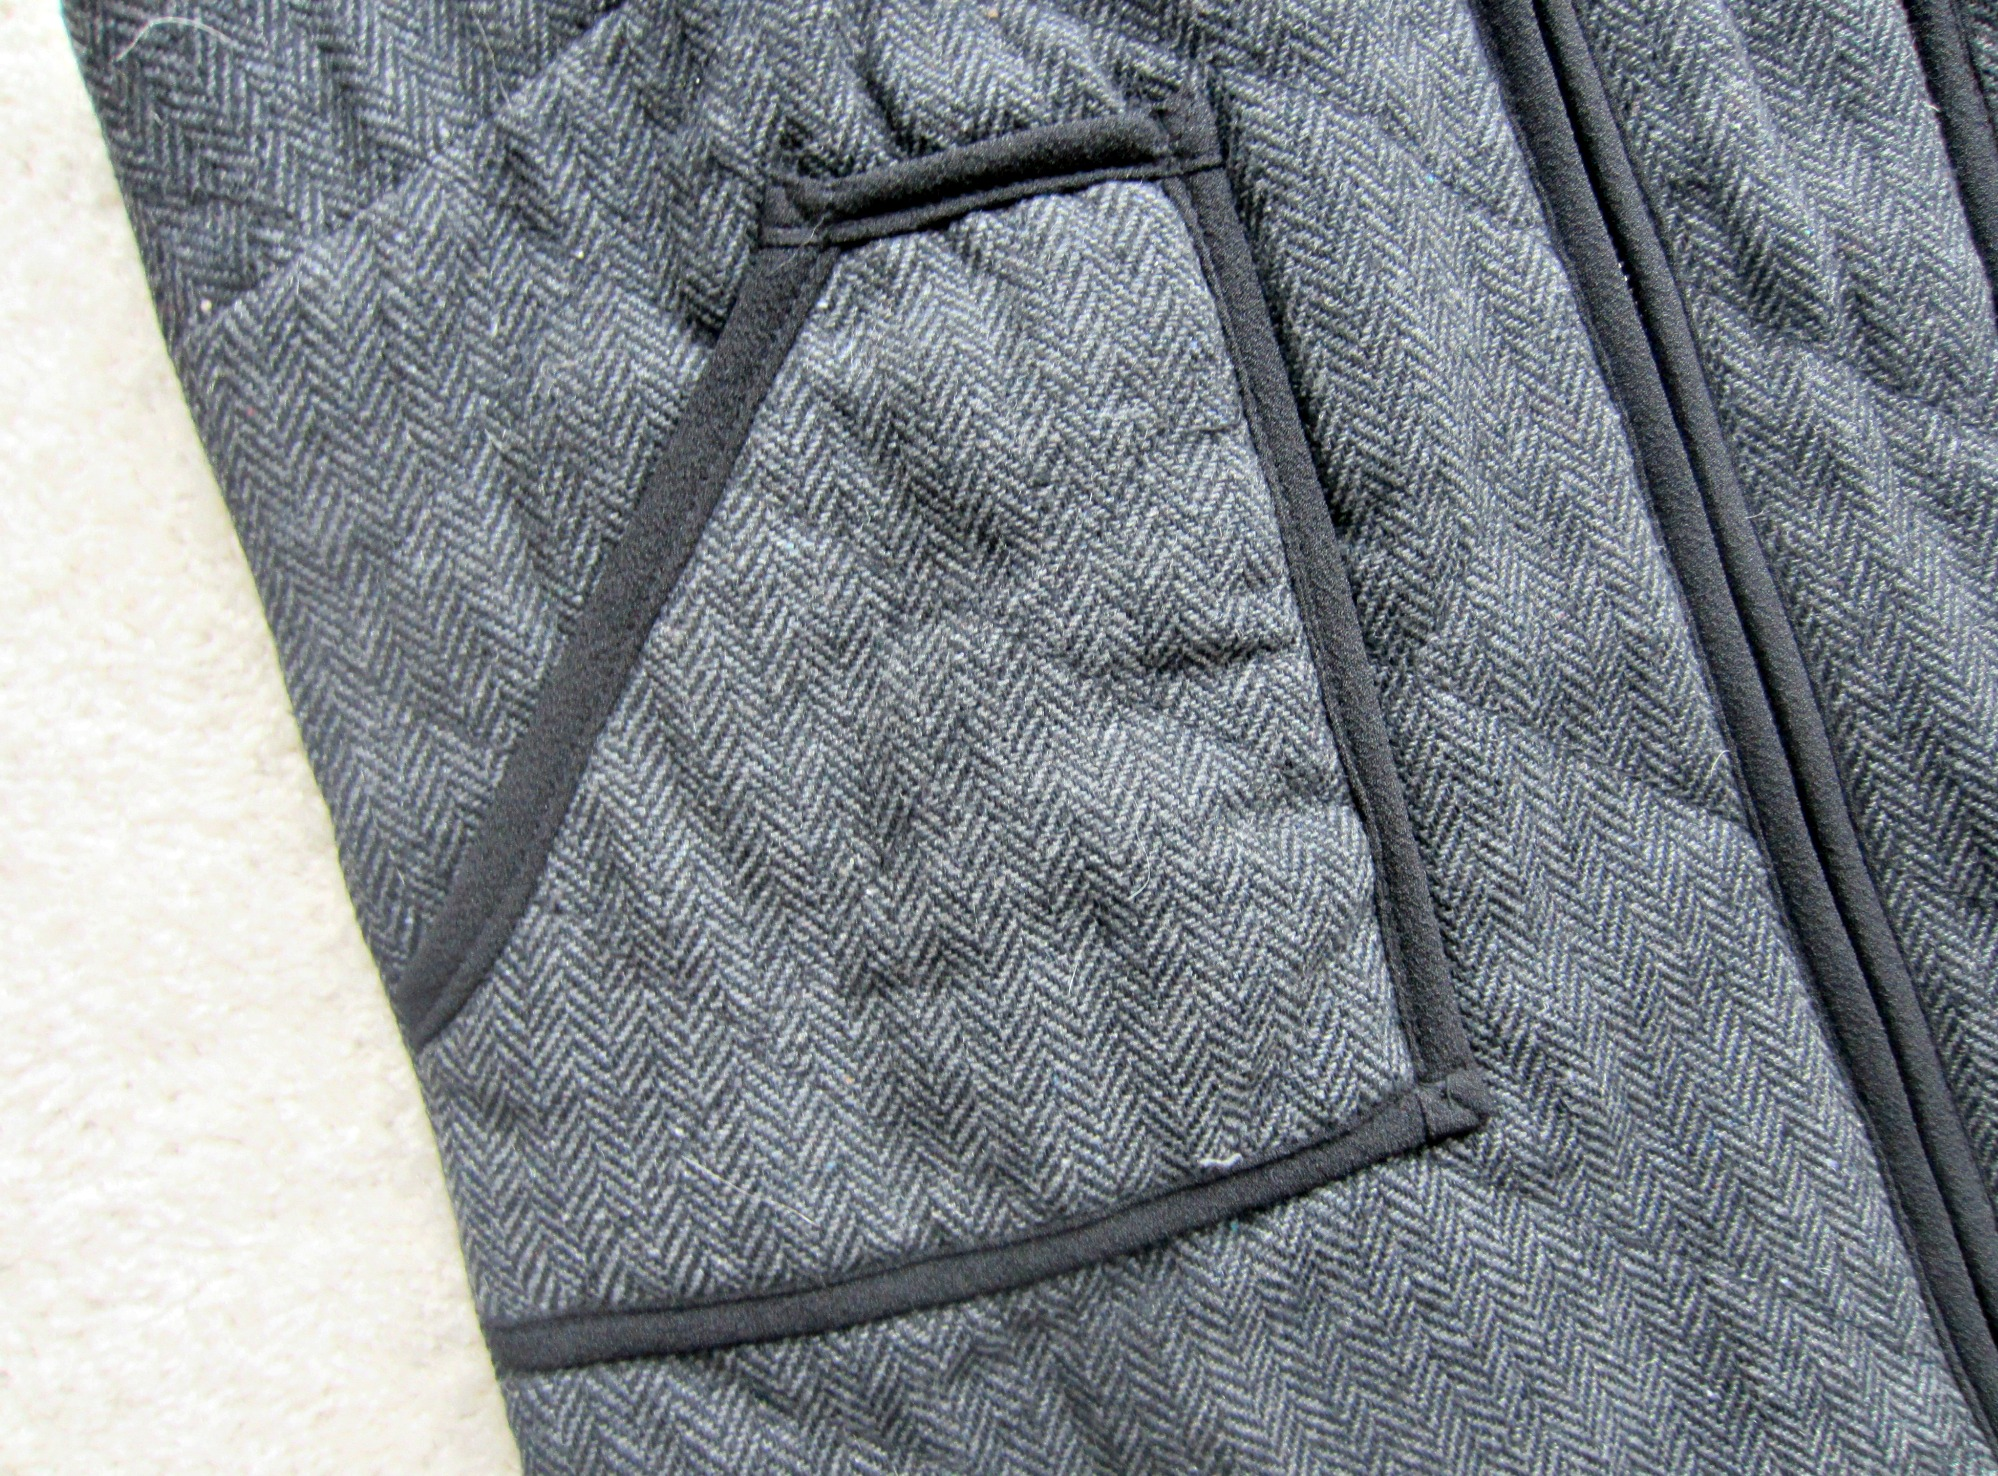 stitch fix vest close up